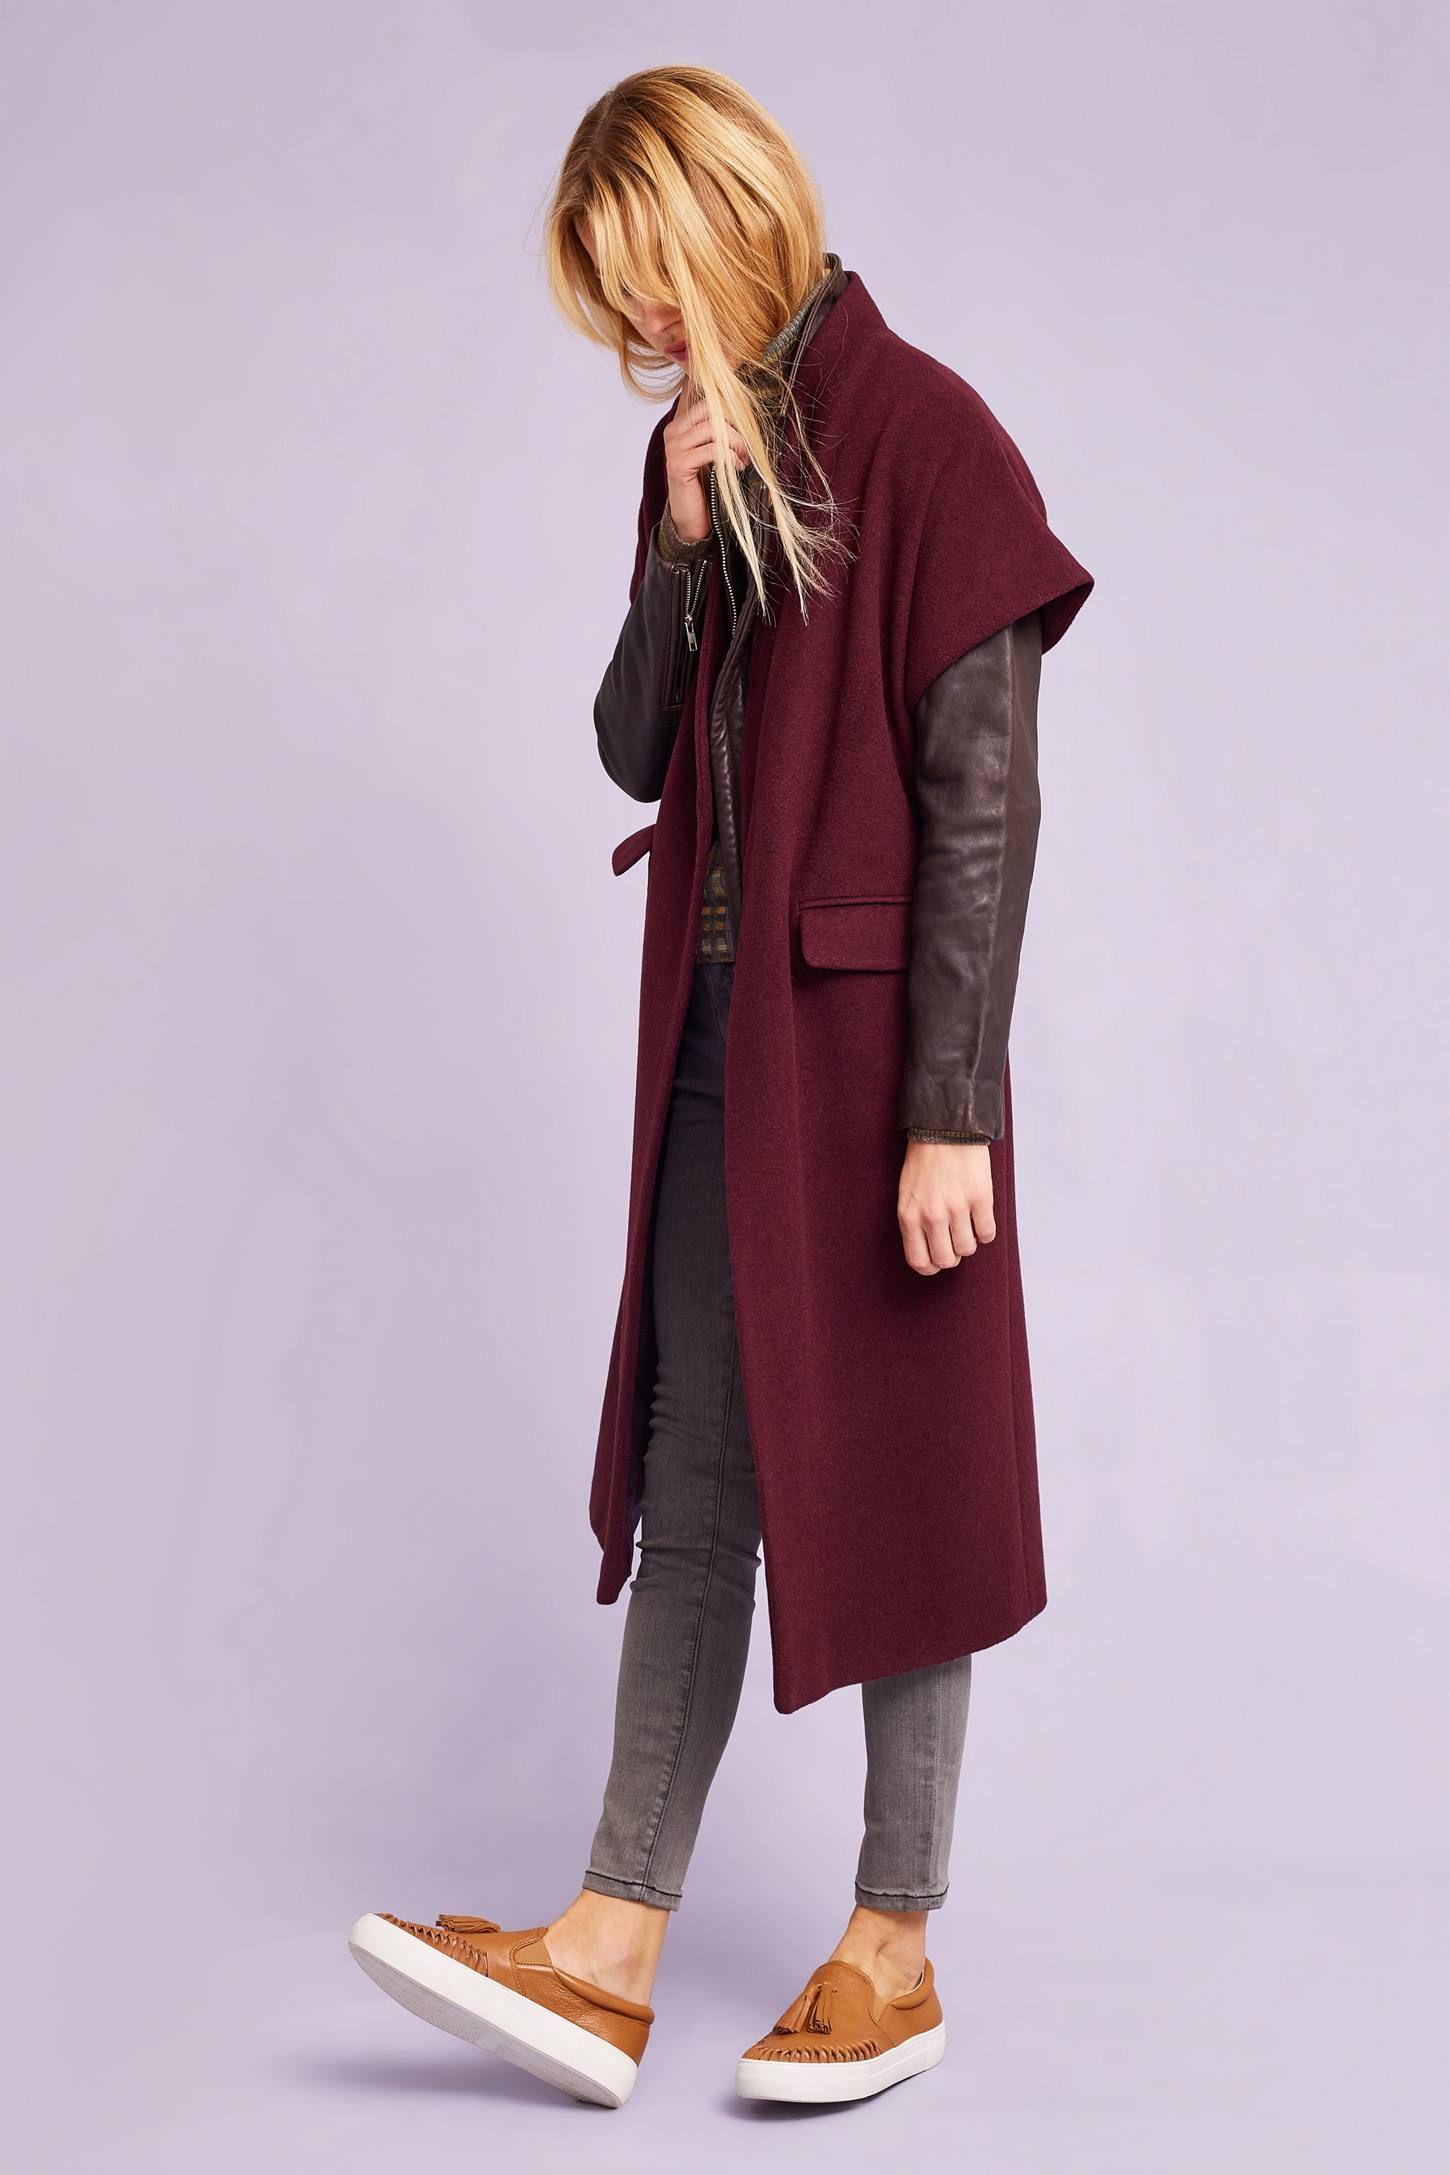 Verona Longline Waistcoat Over Leather Jacket Anthropologie